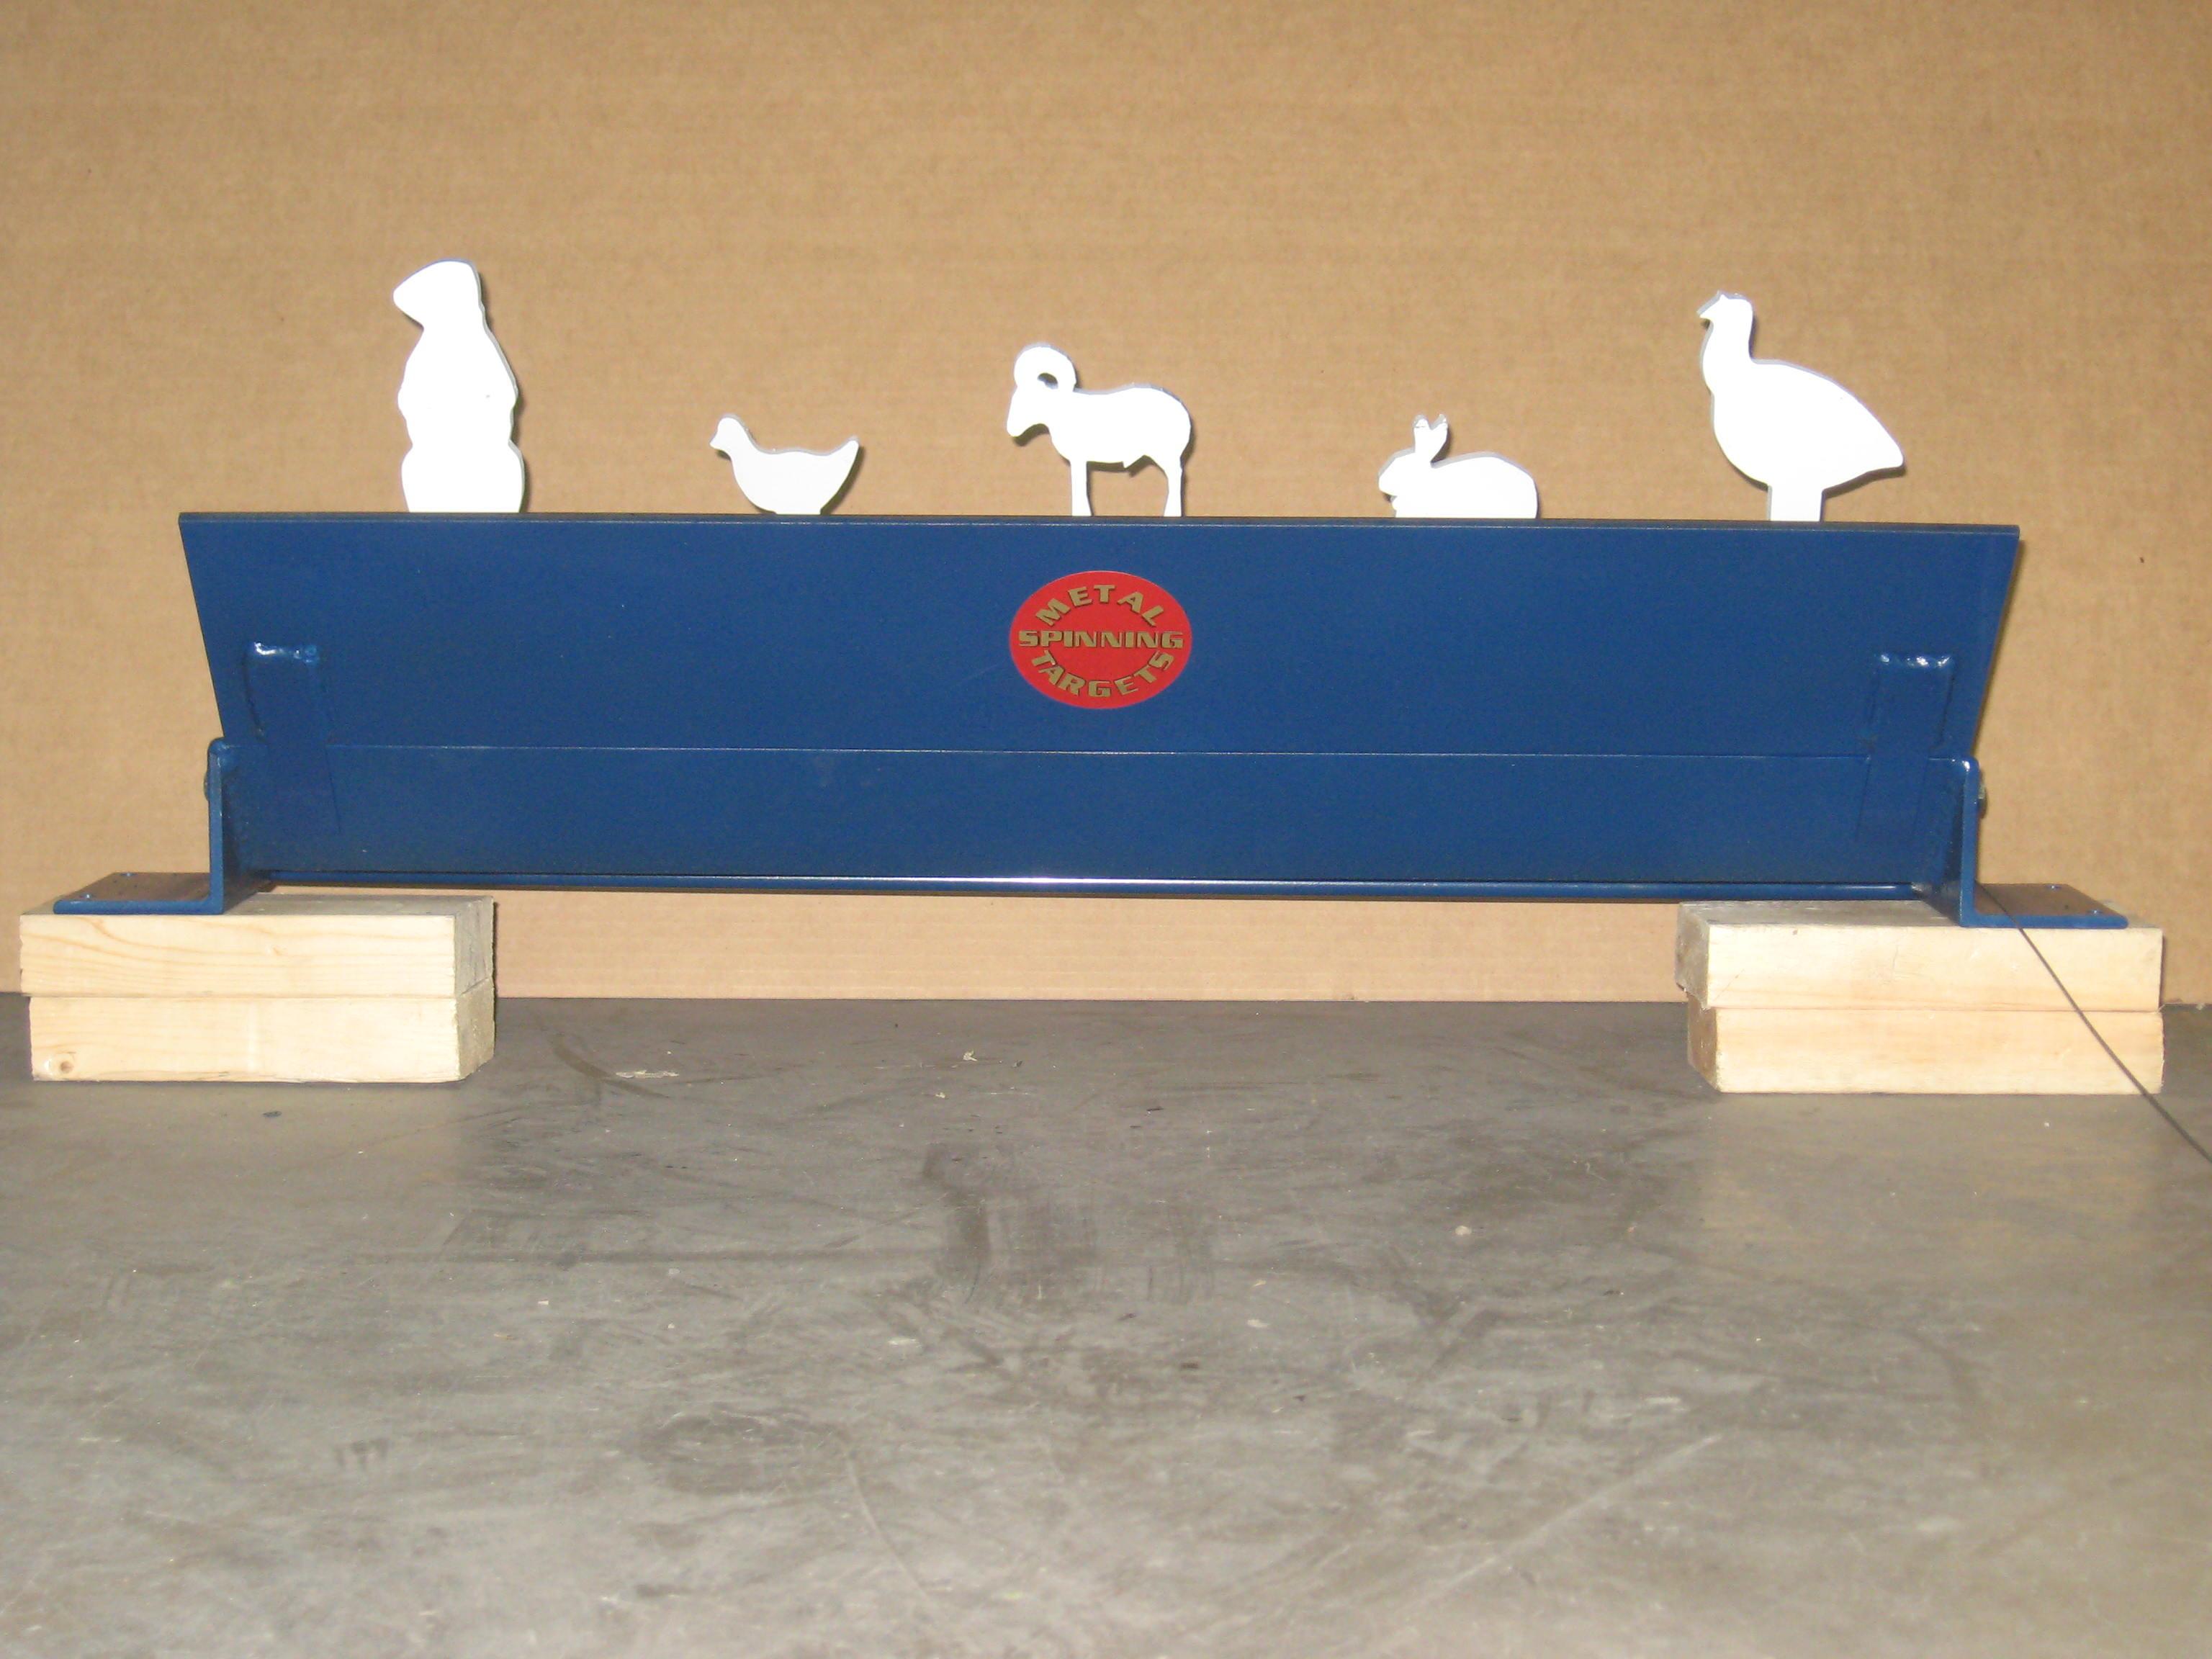 YHEC/NRA Rim Fire national Match Plate Rack